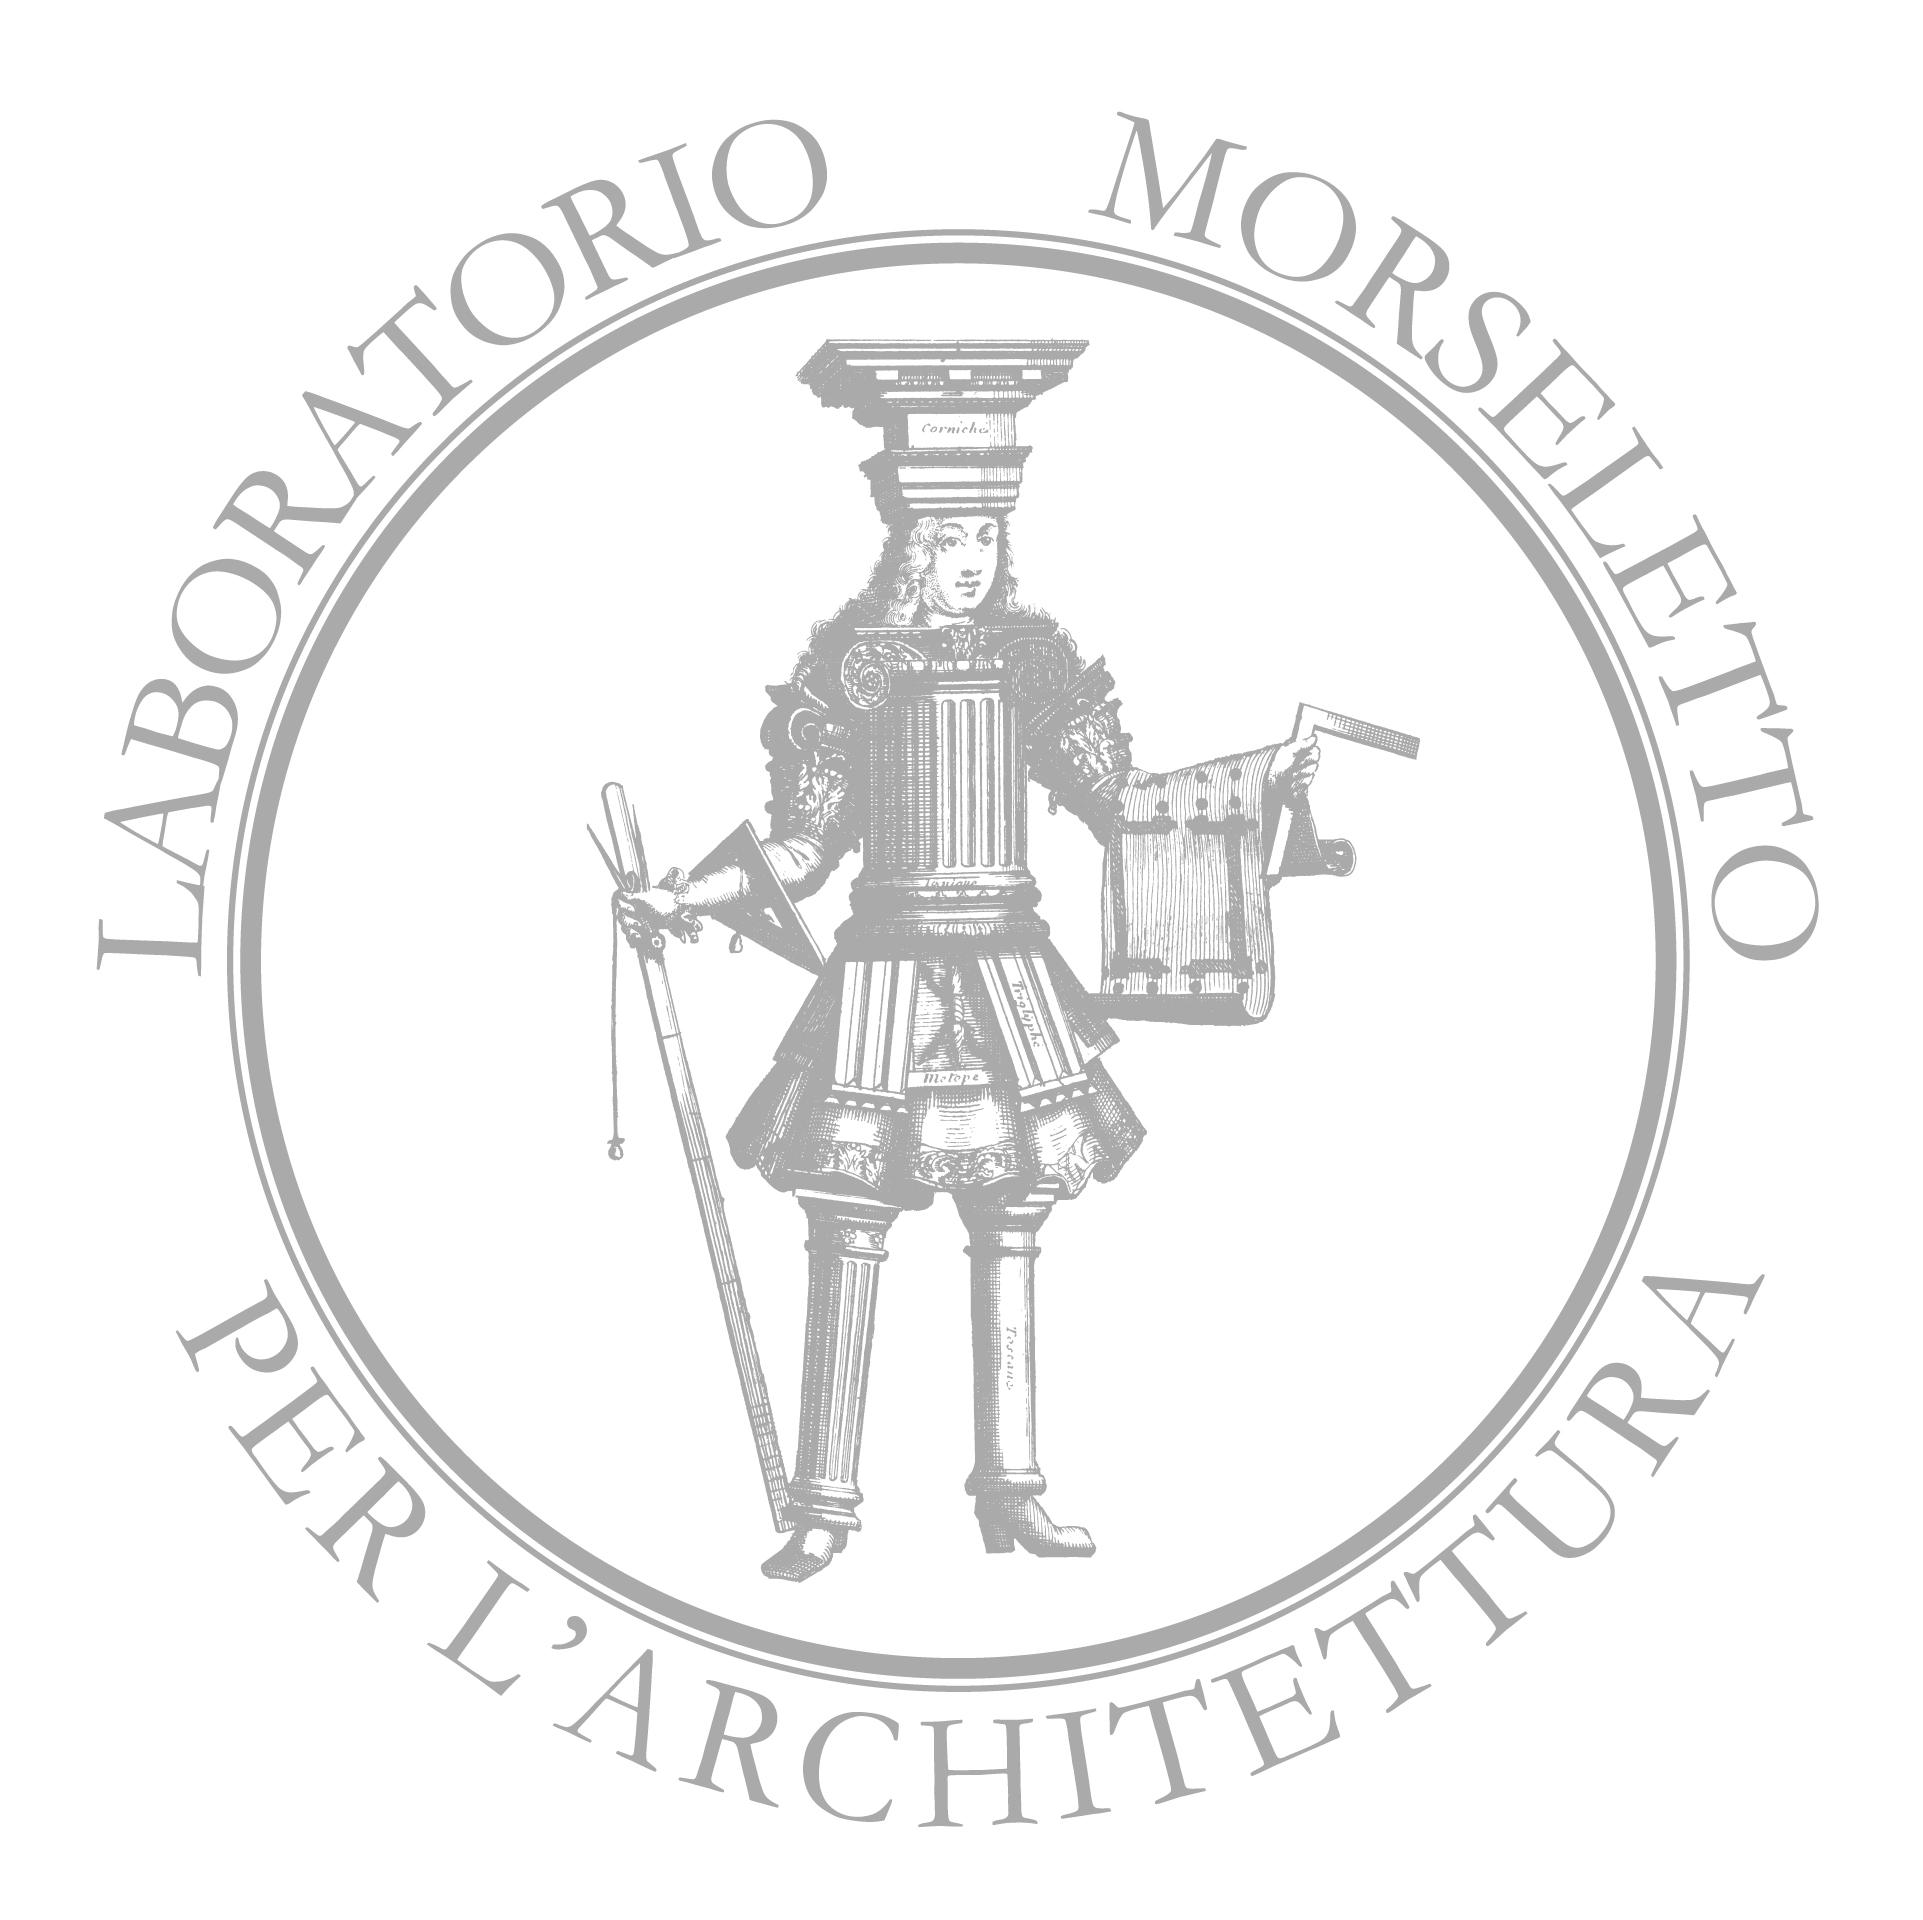 Morseletto